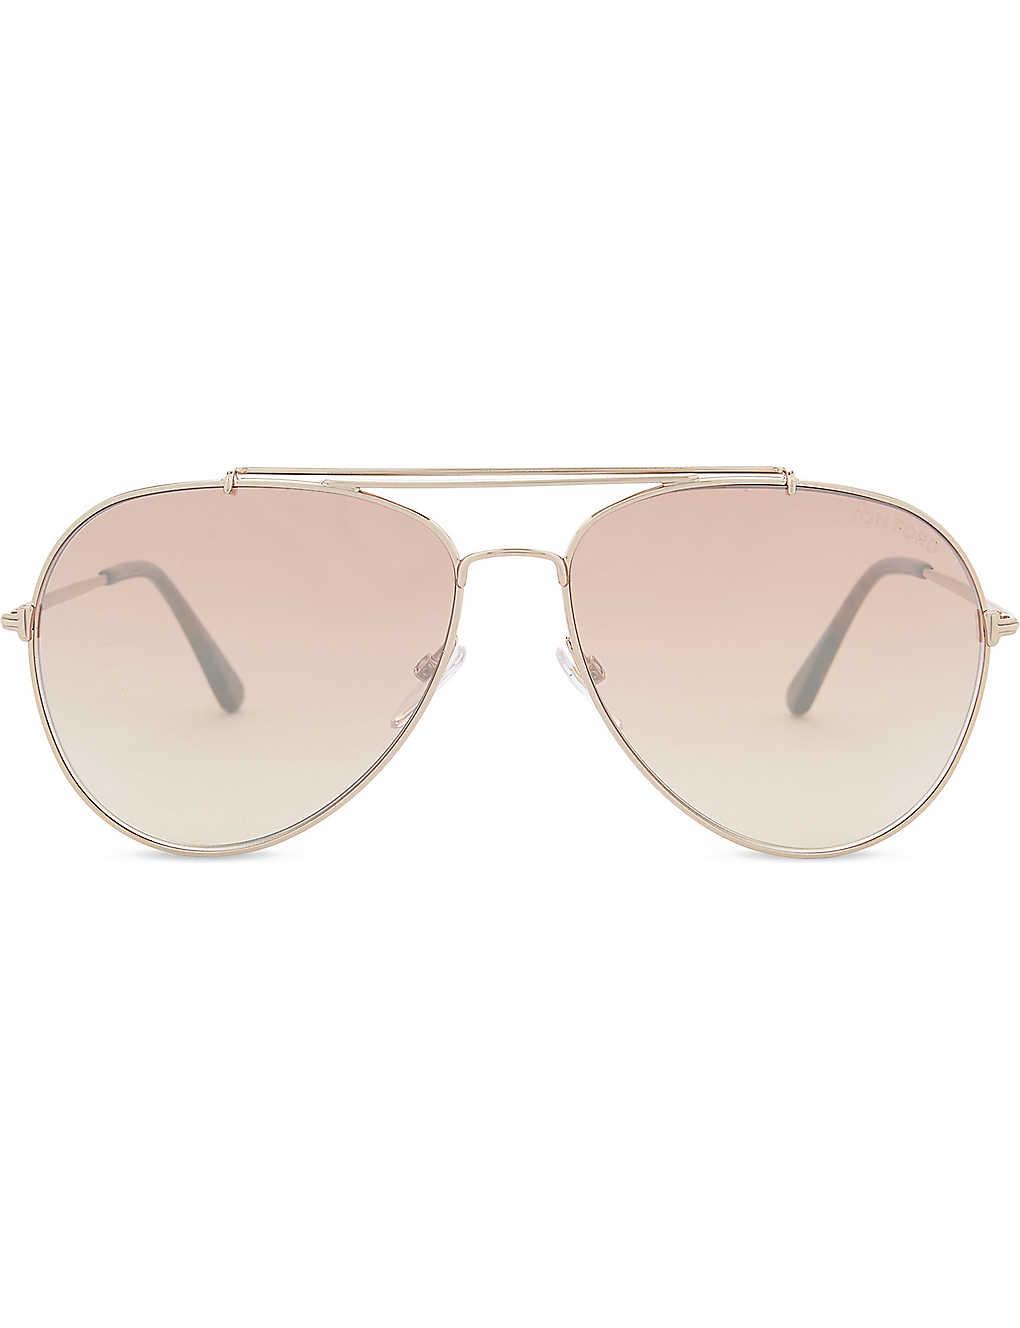 1c0785137a9d4 Indiana aviator sunglasses - Pink gold ...